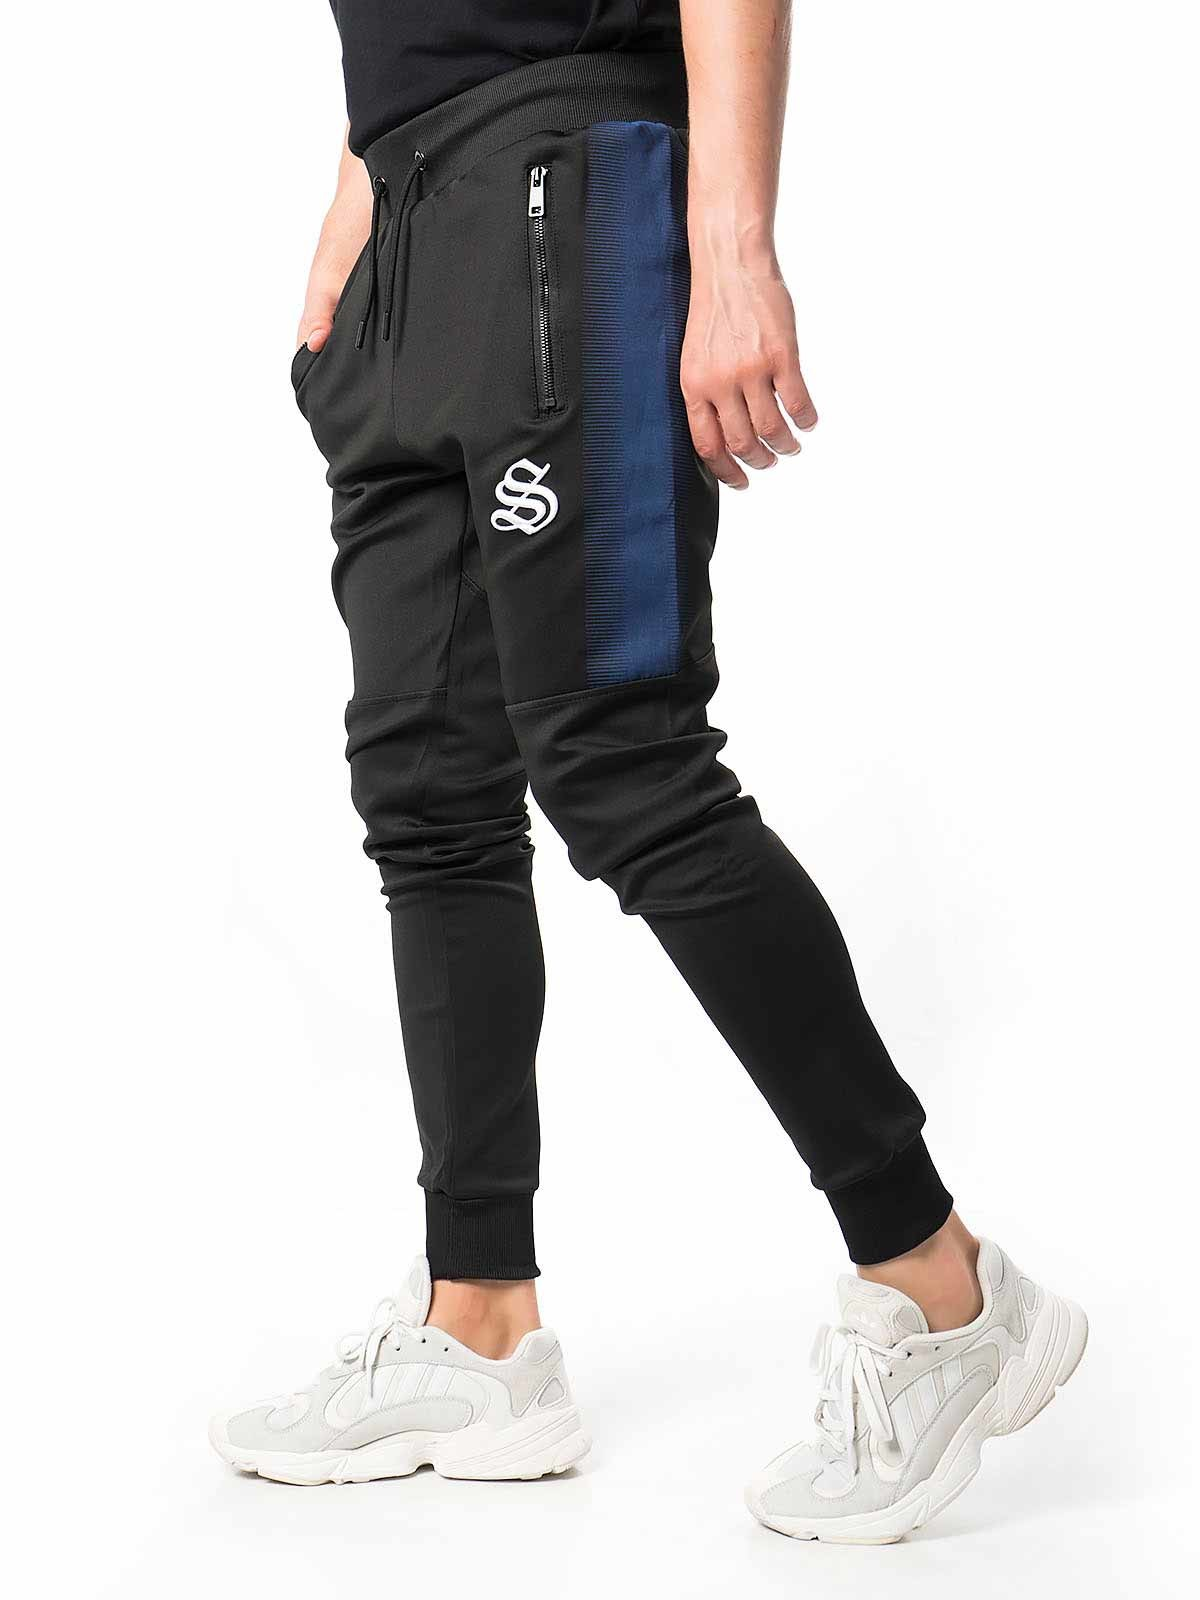 Pantalones de chándal hombre con raya